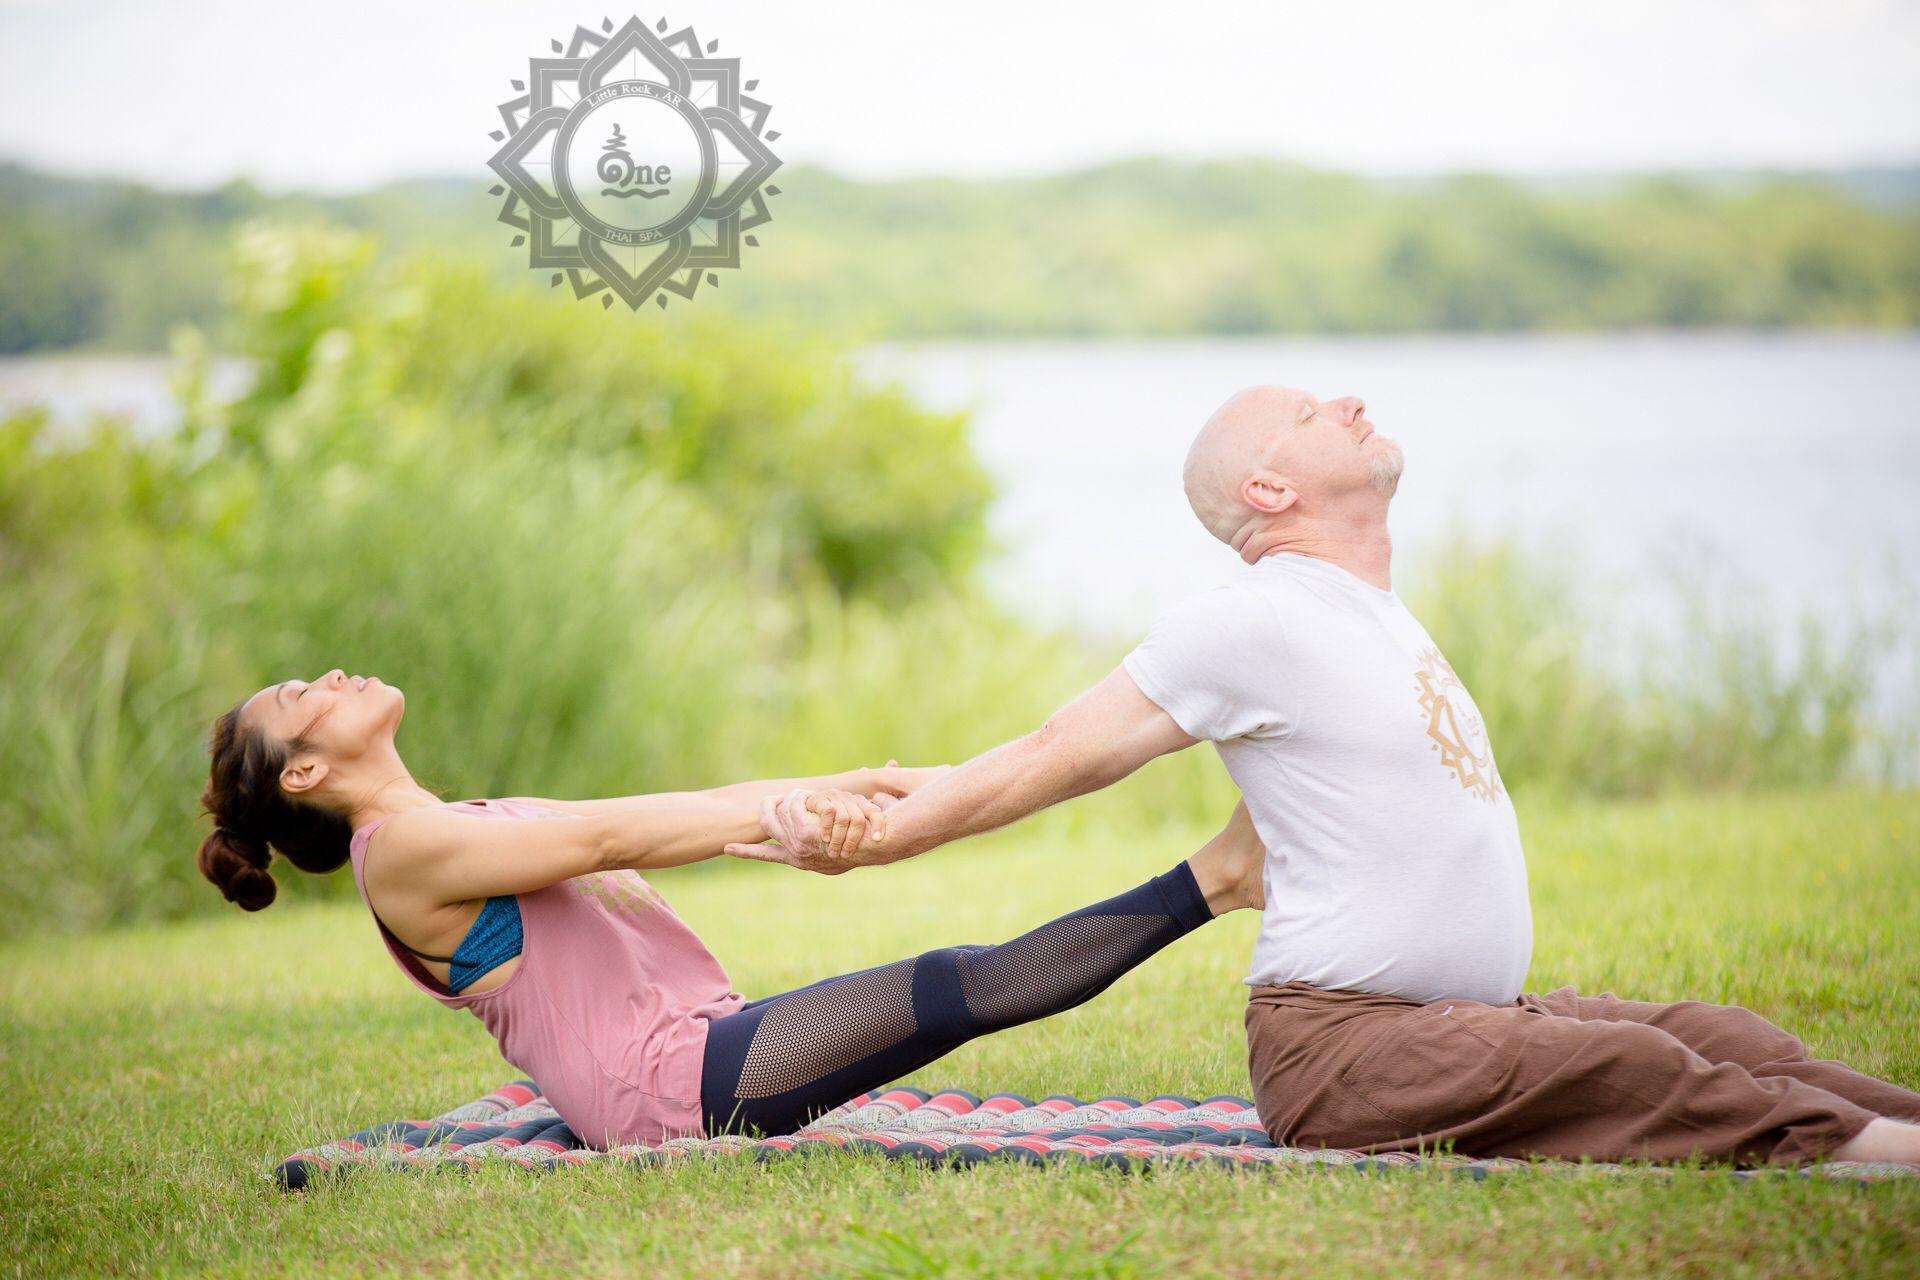 Thai Massage #Onethaispa   Thai massage, Couples massage